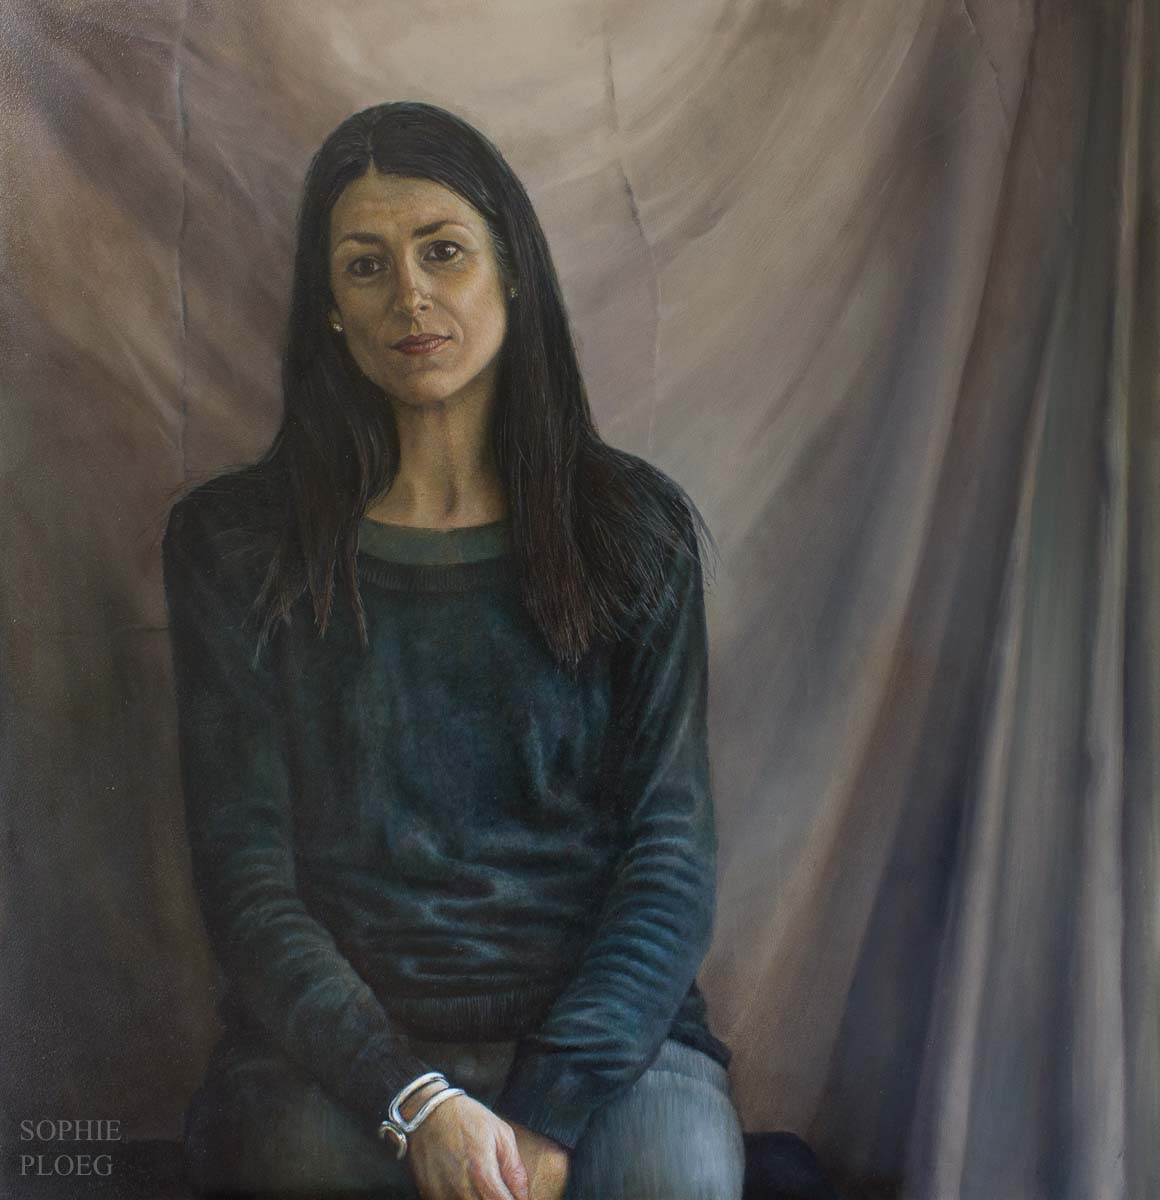 Sophie Ploeg, Nelly oil painting